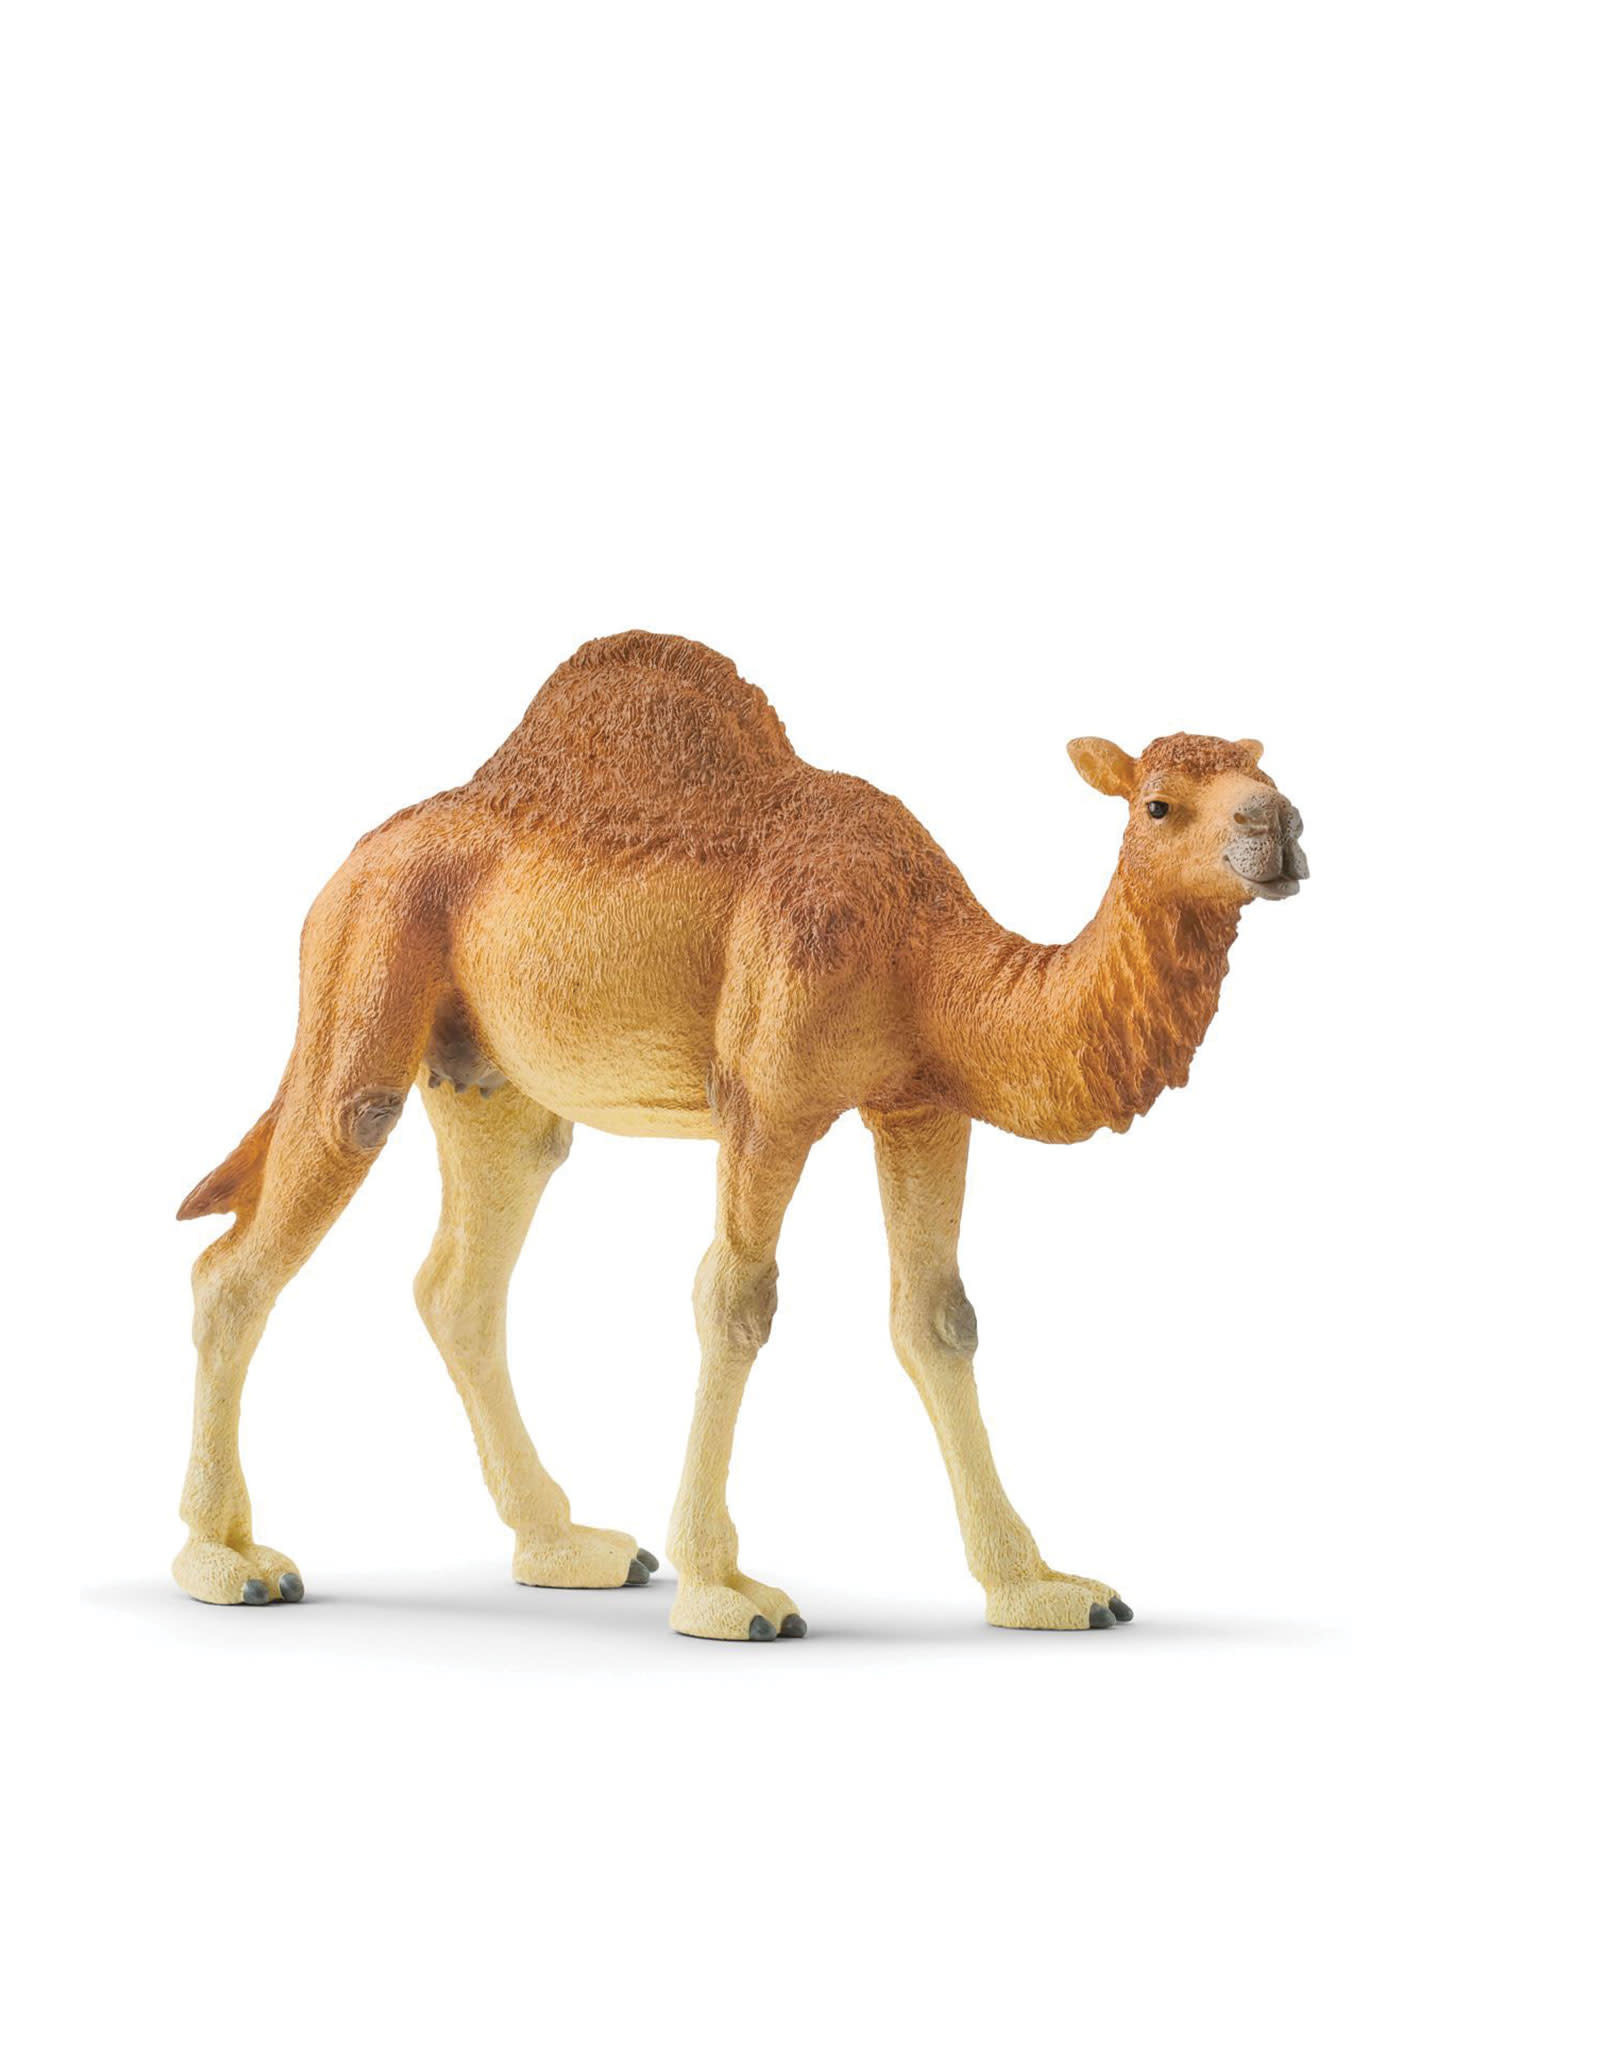 Schleich Animal - Dromadary